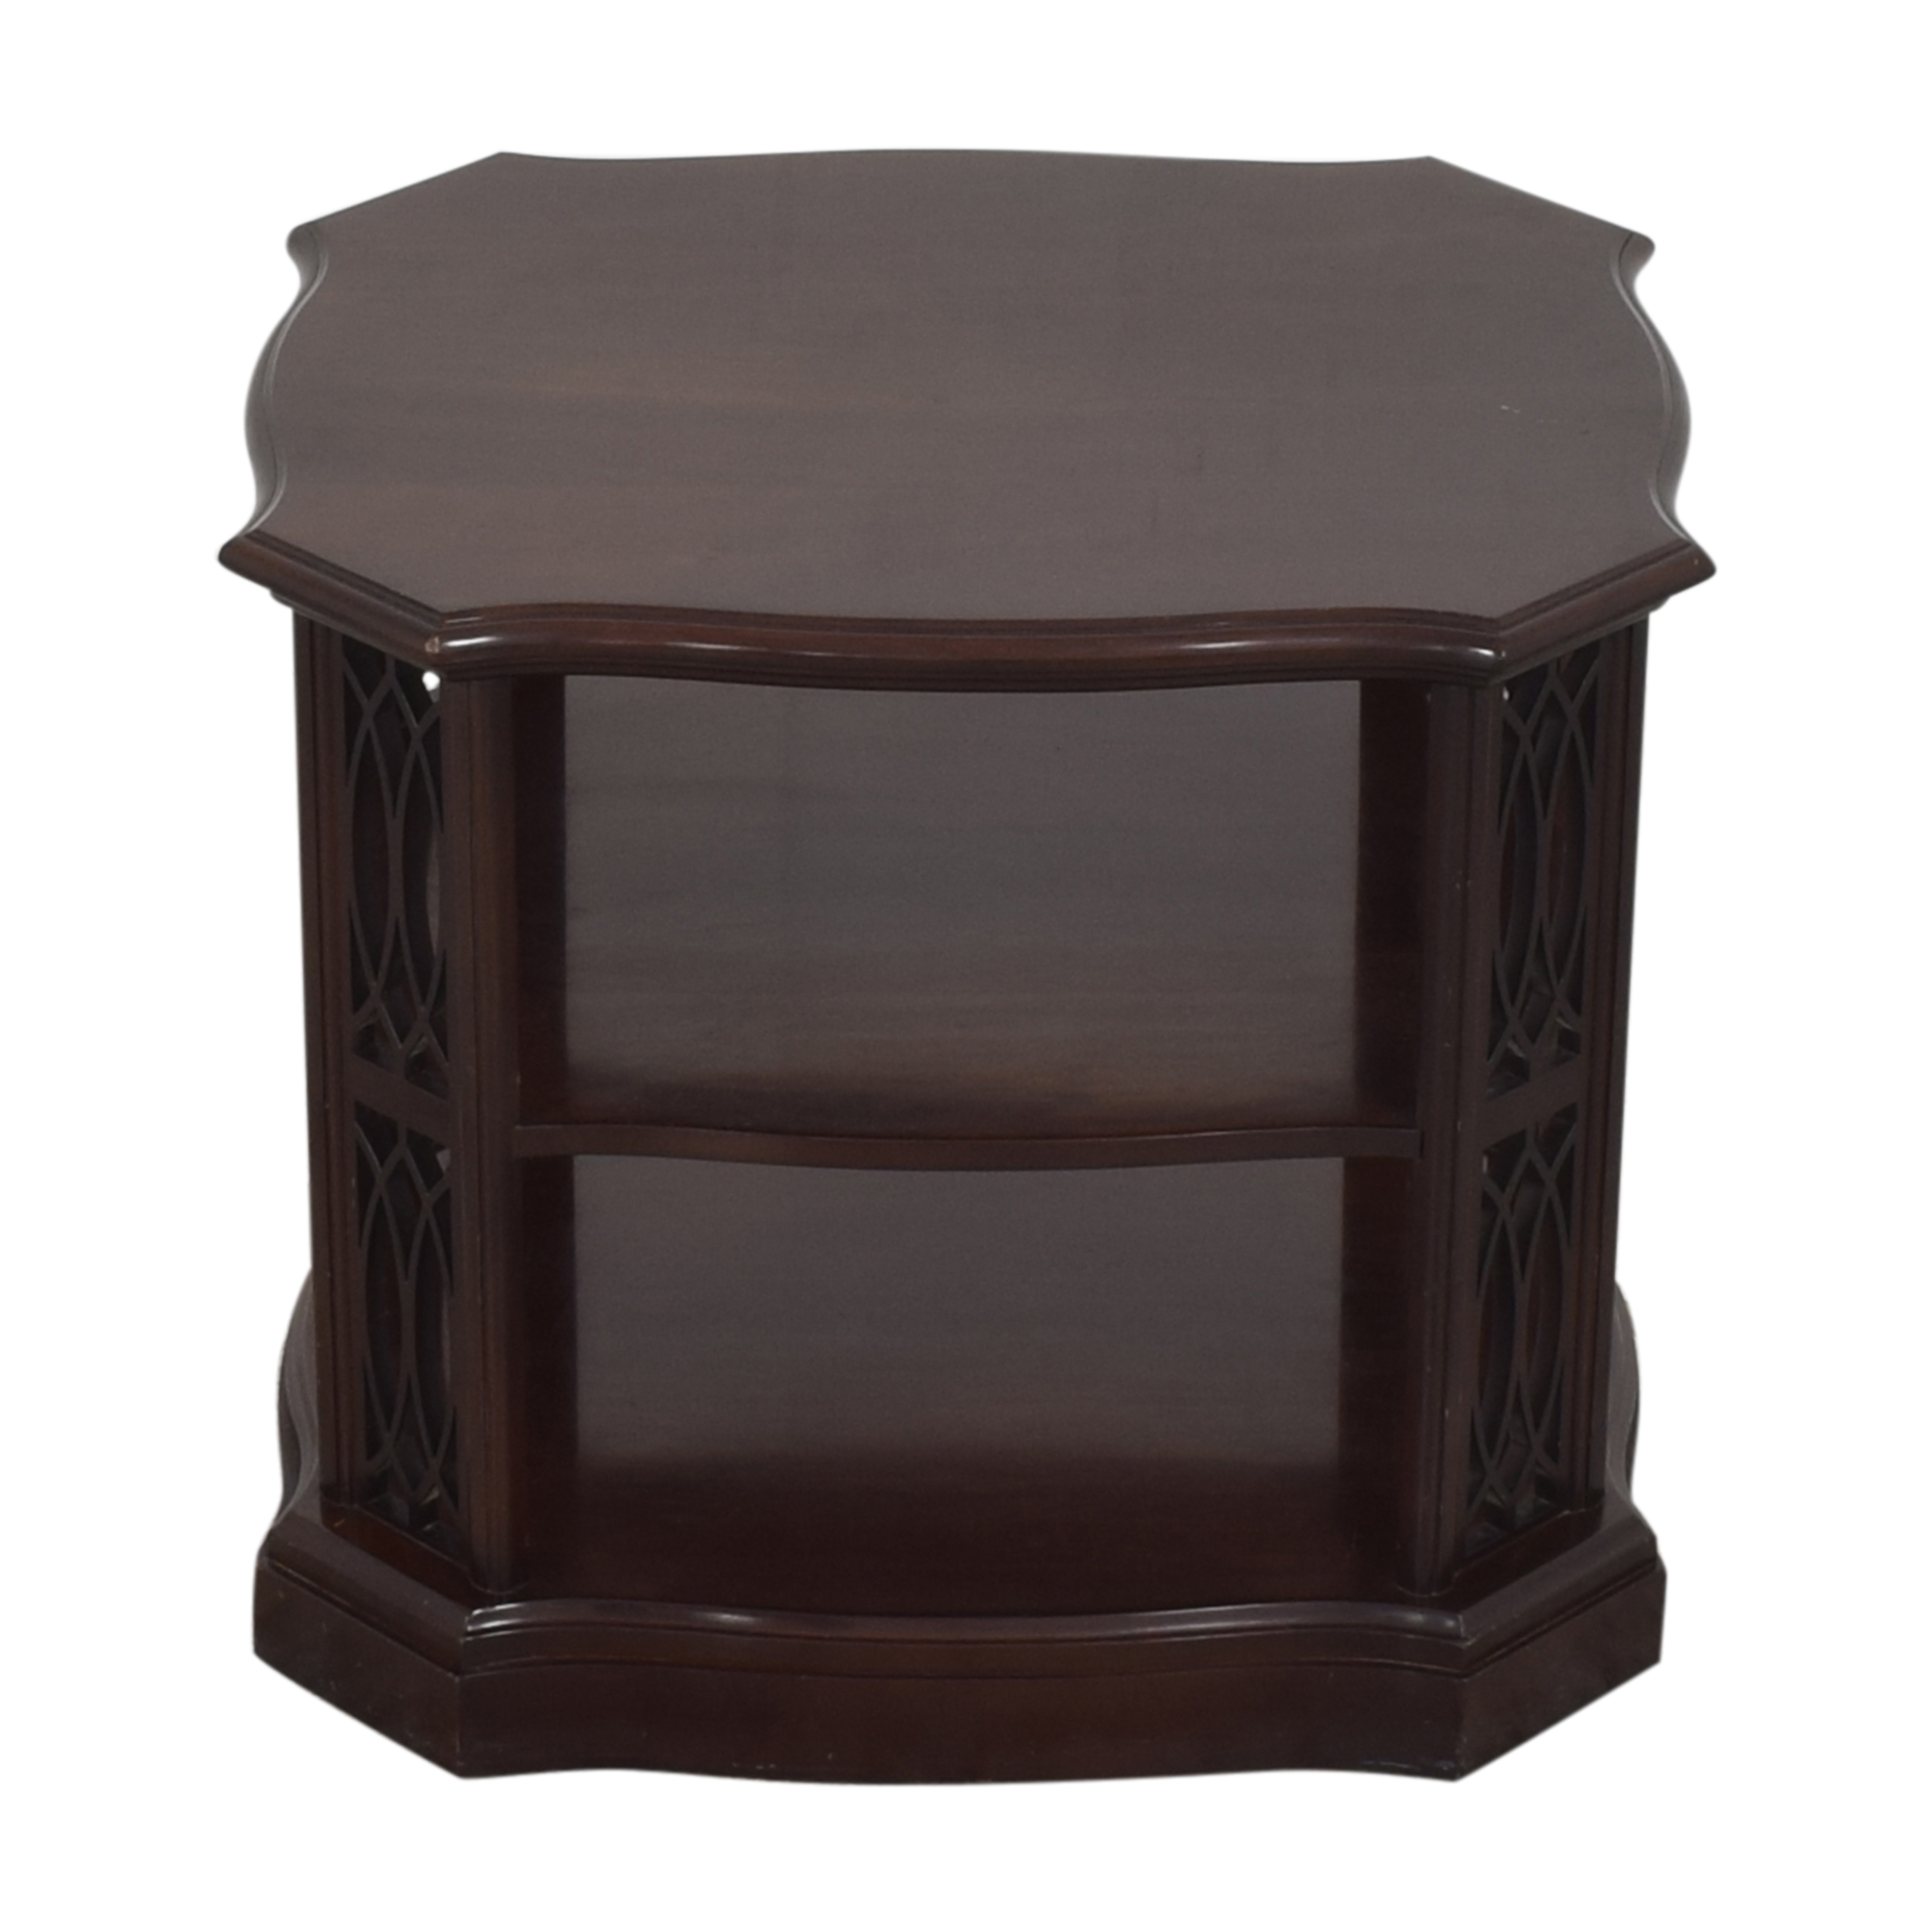 Stickley Furniture Stickley Furniture End Table pa